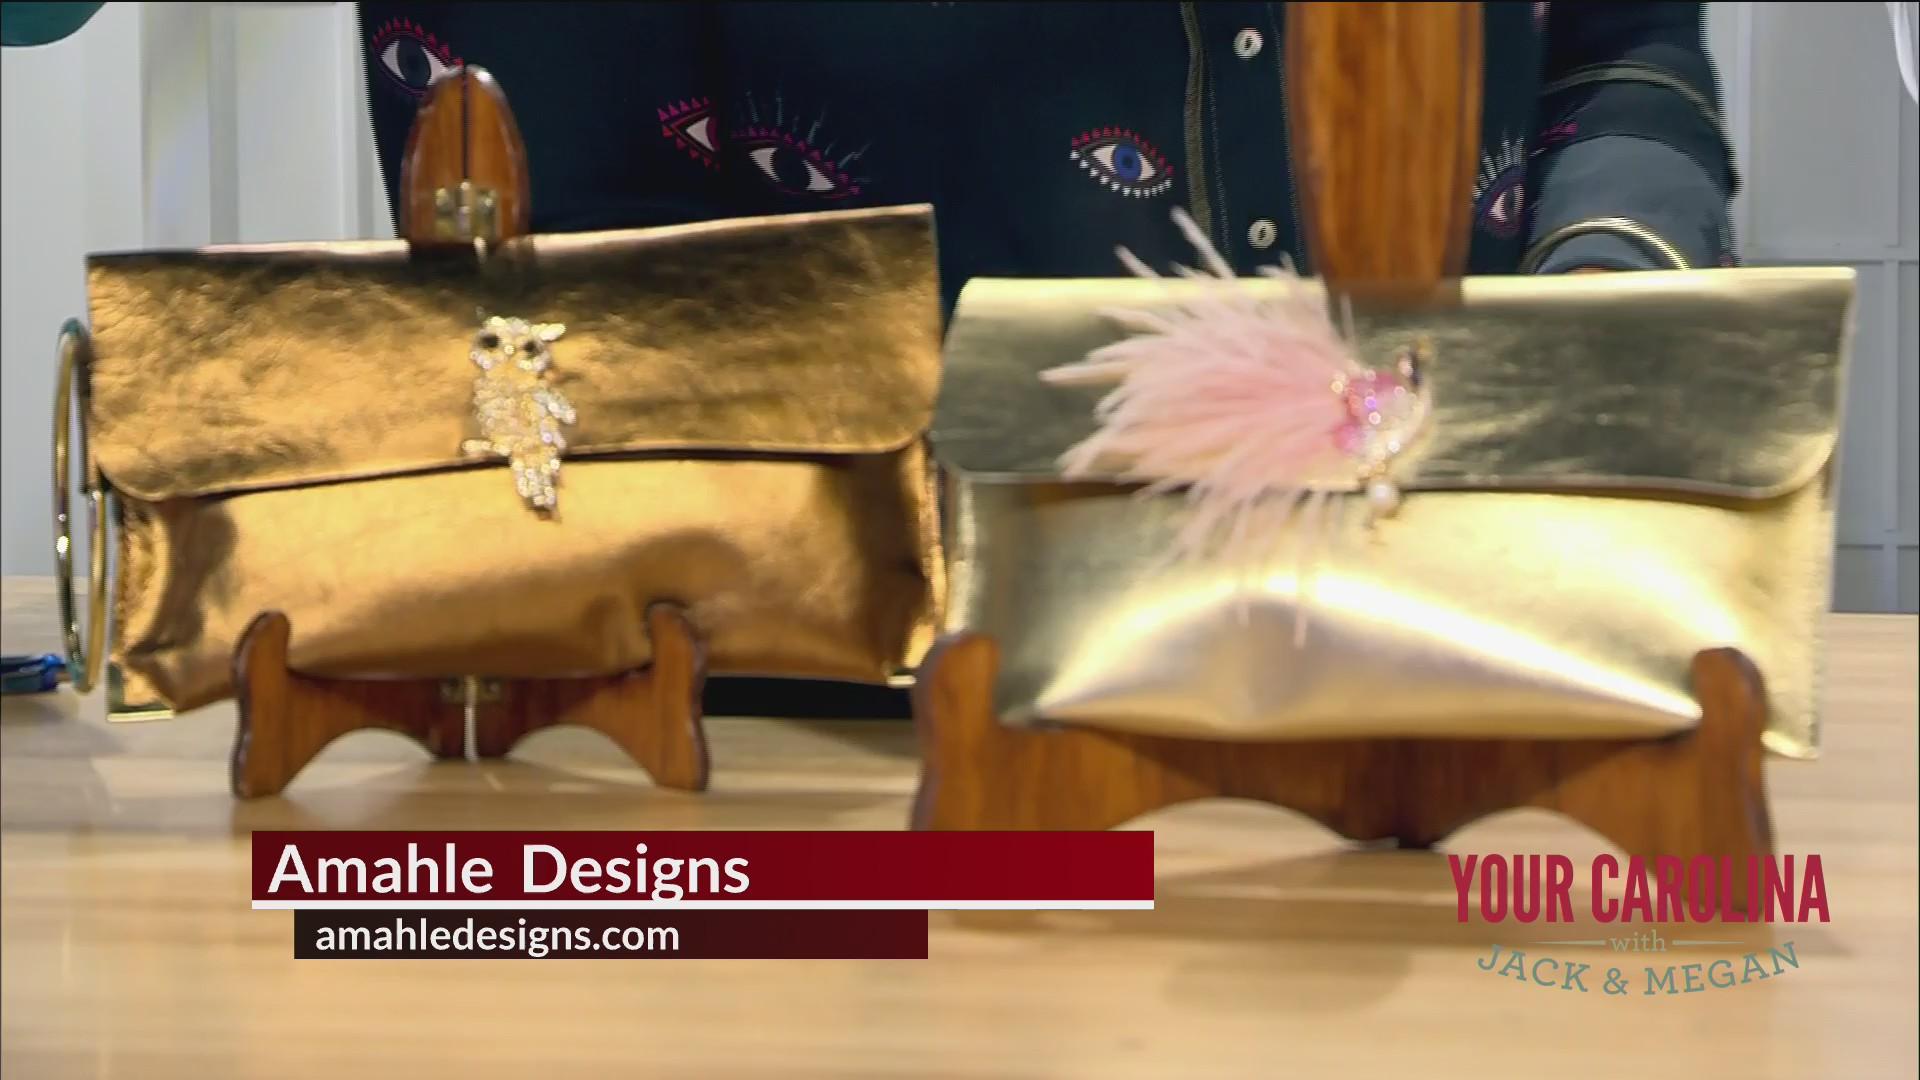 Amahle Designs